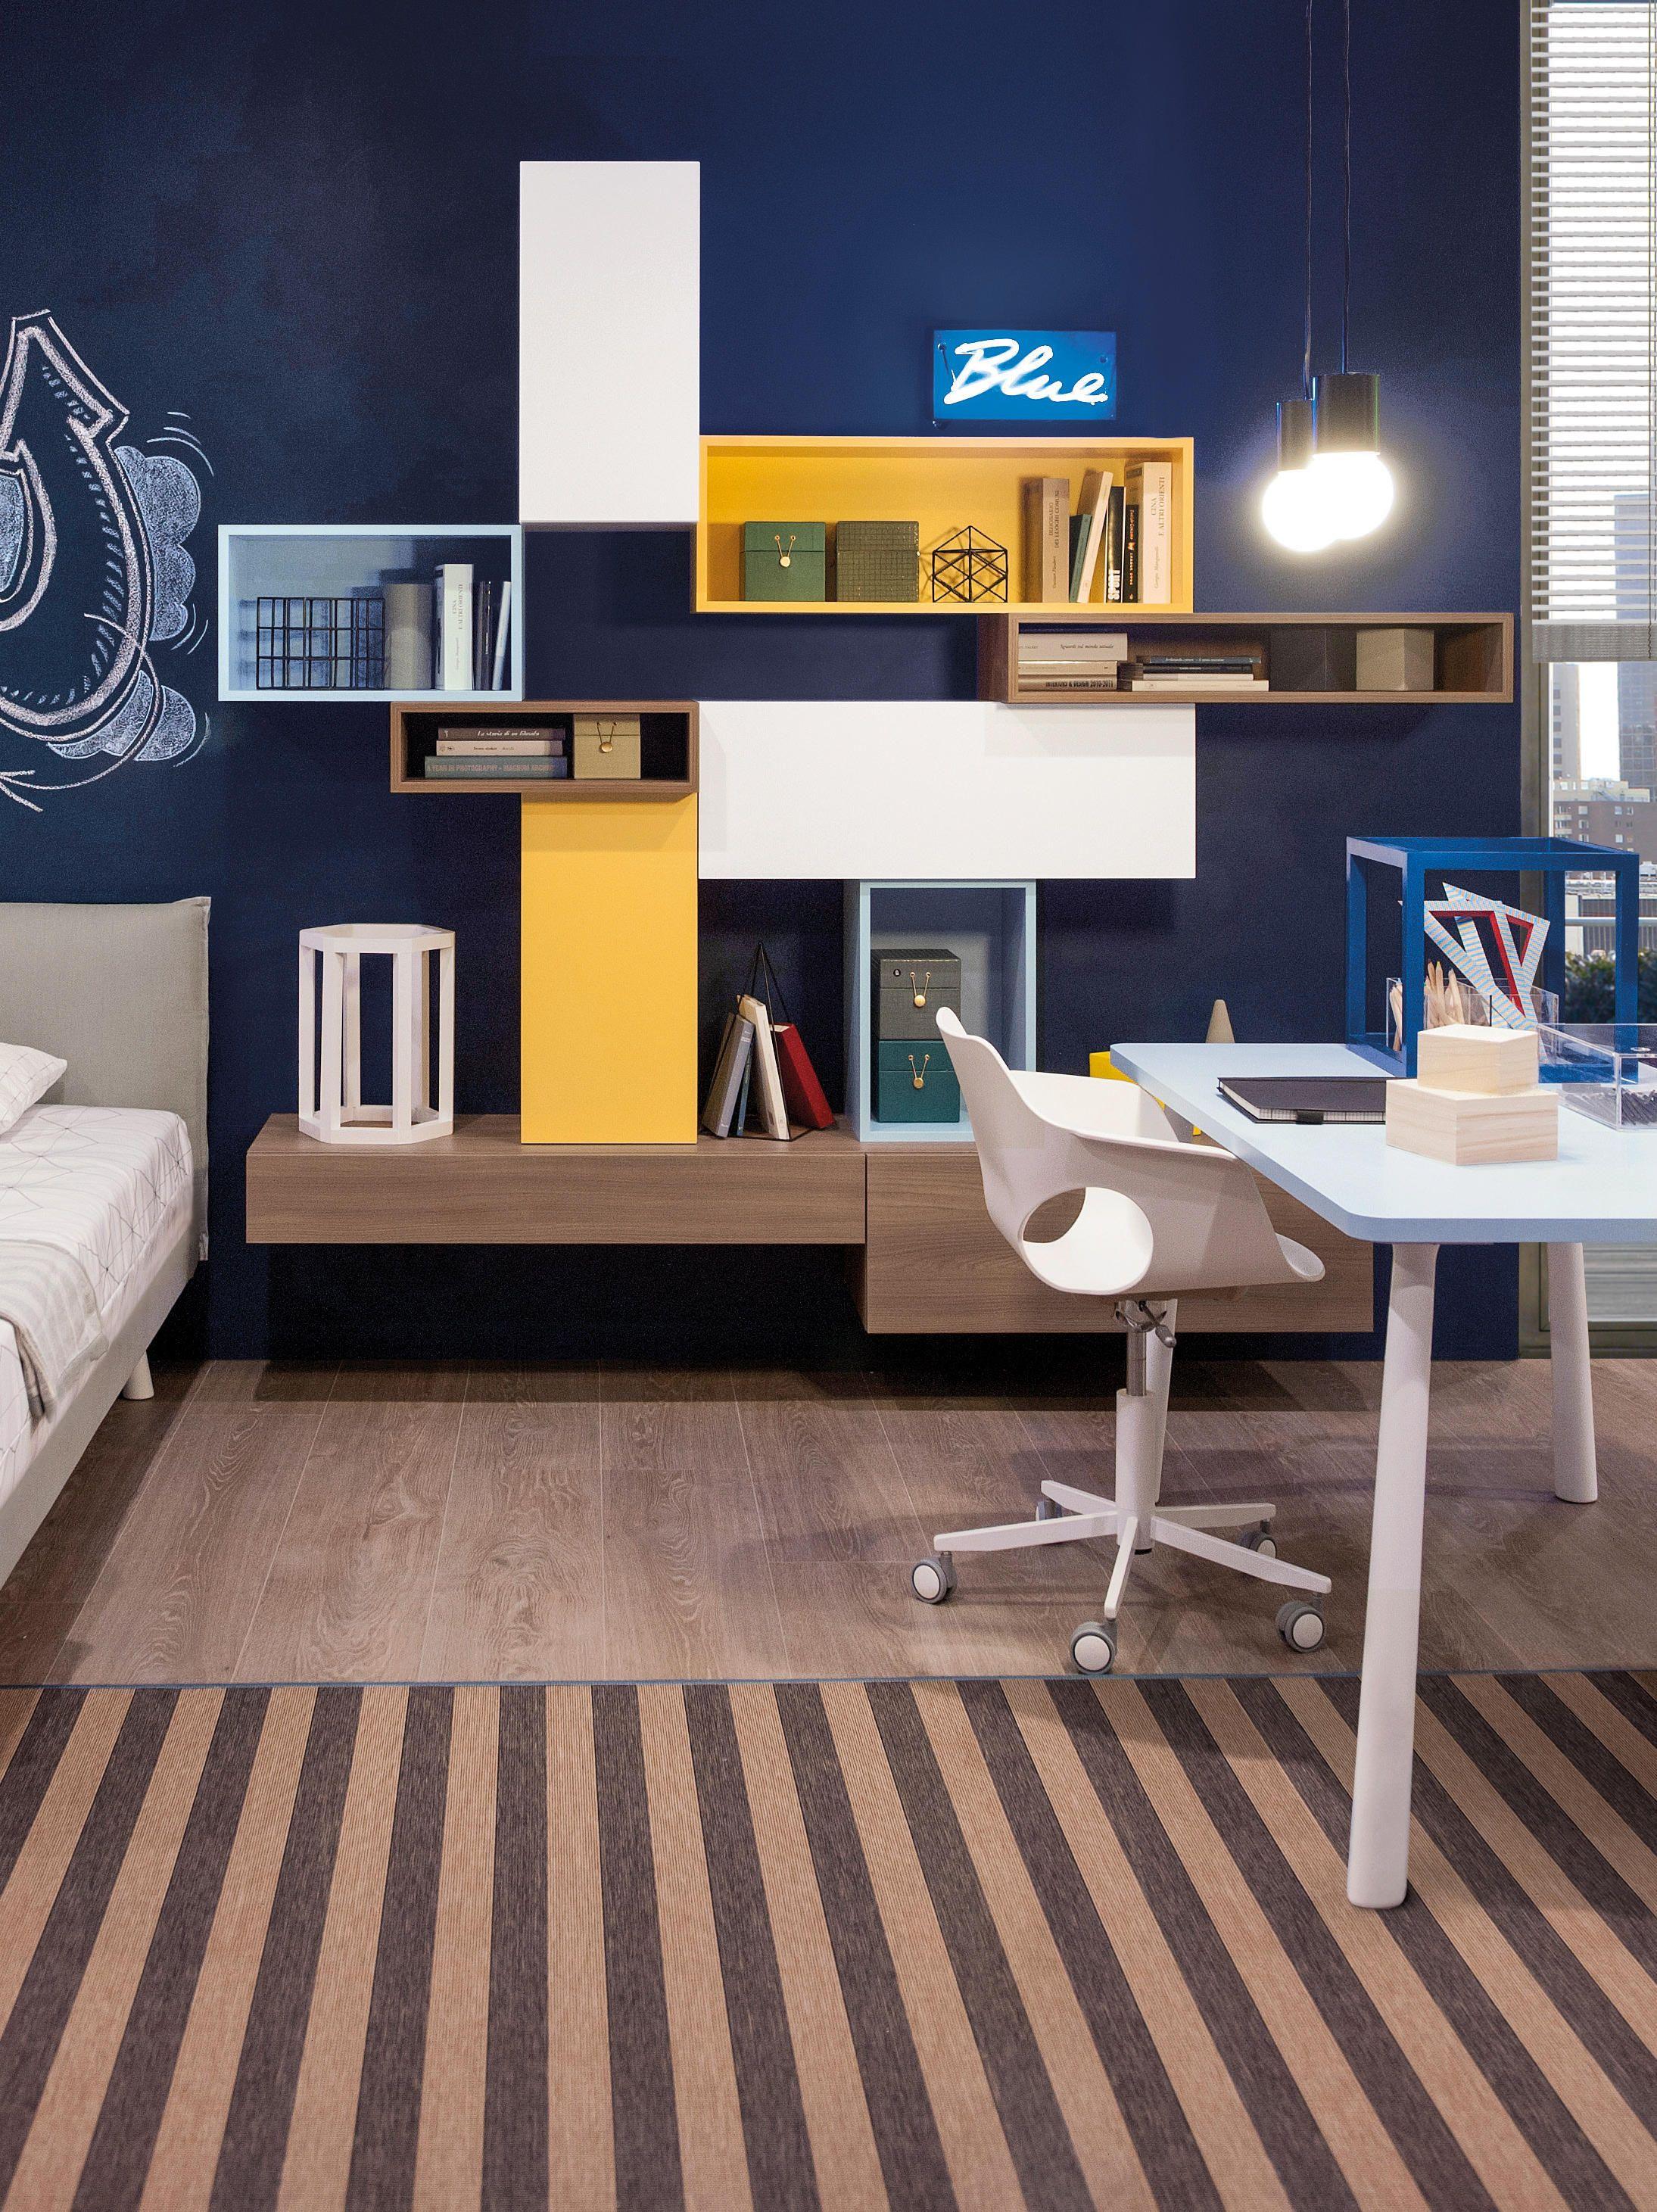 Z564 Designer Kids storage furniture from Zalf all